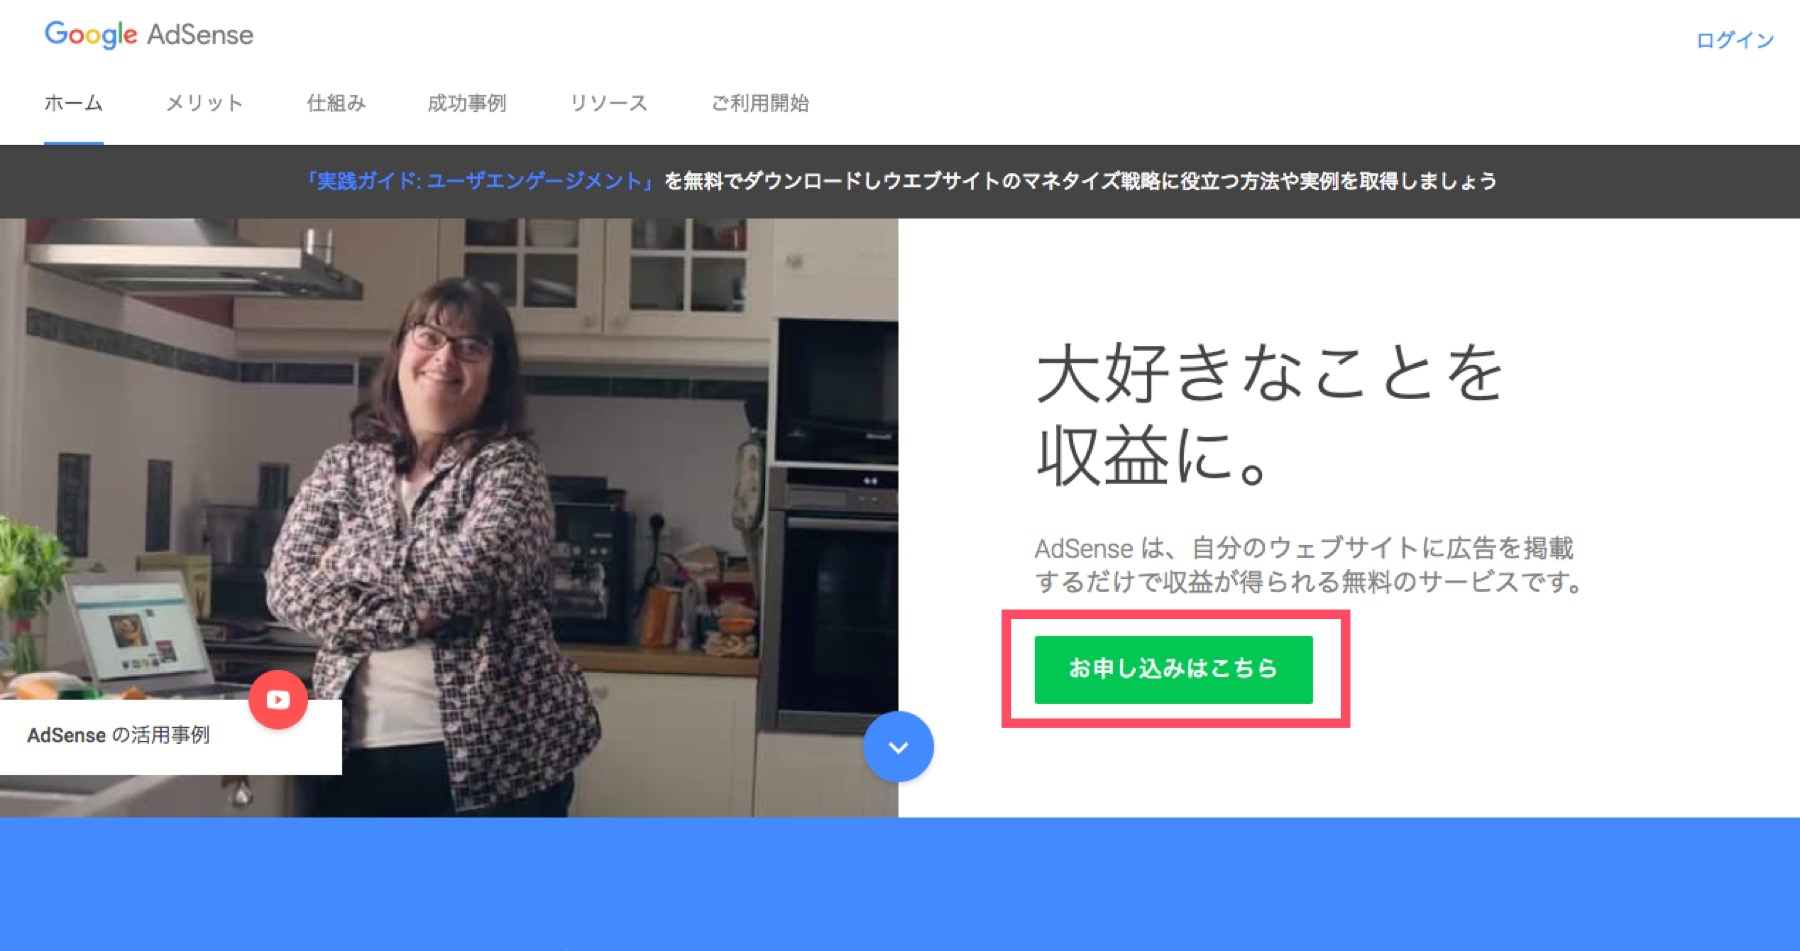 Google AdSenseの登録ページ